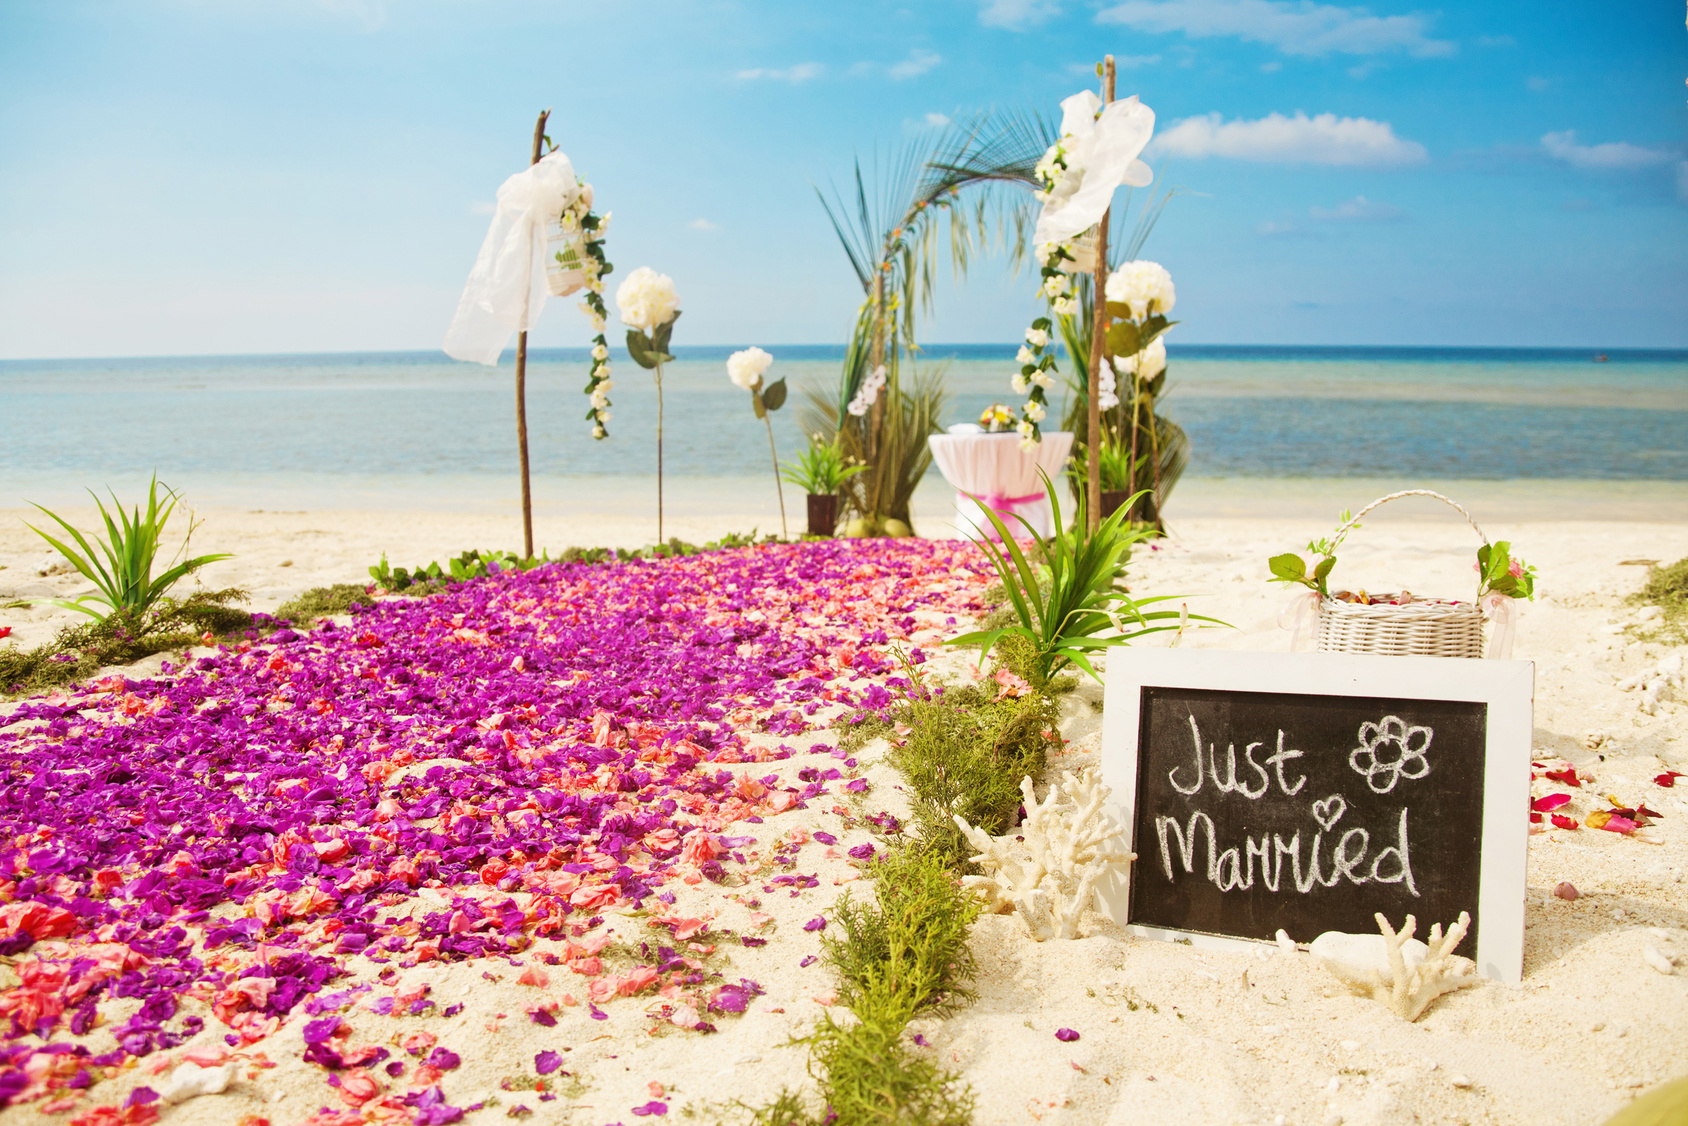 Http www mariage brest fr wp content uploads 2014 03 fond mariage